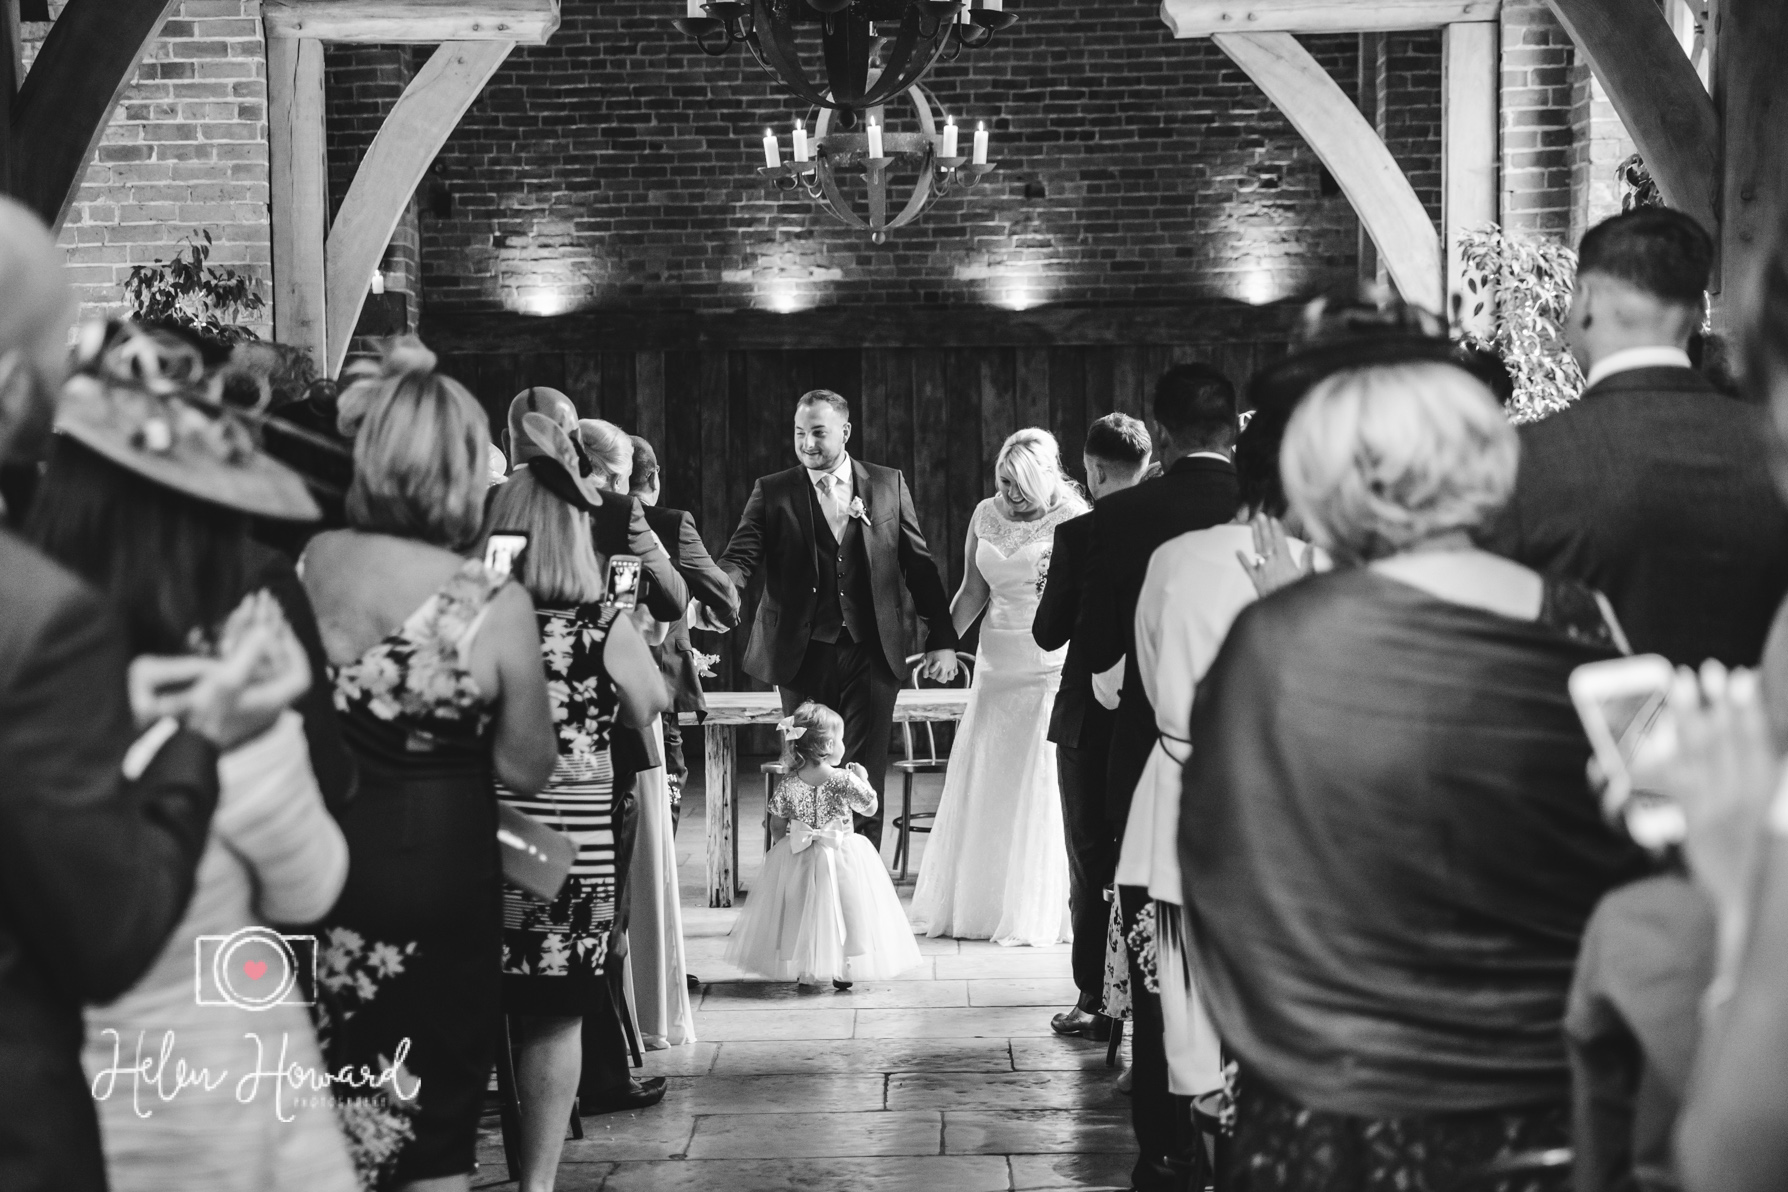 Shustoke Farm Barns Wedding Photography by Helen Howard-21.jpg